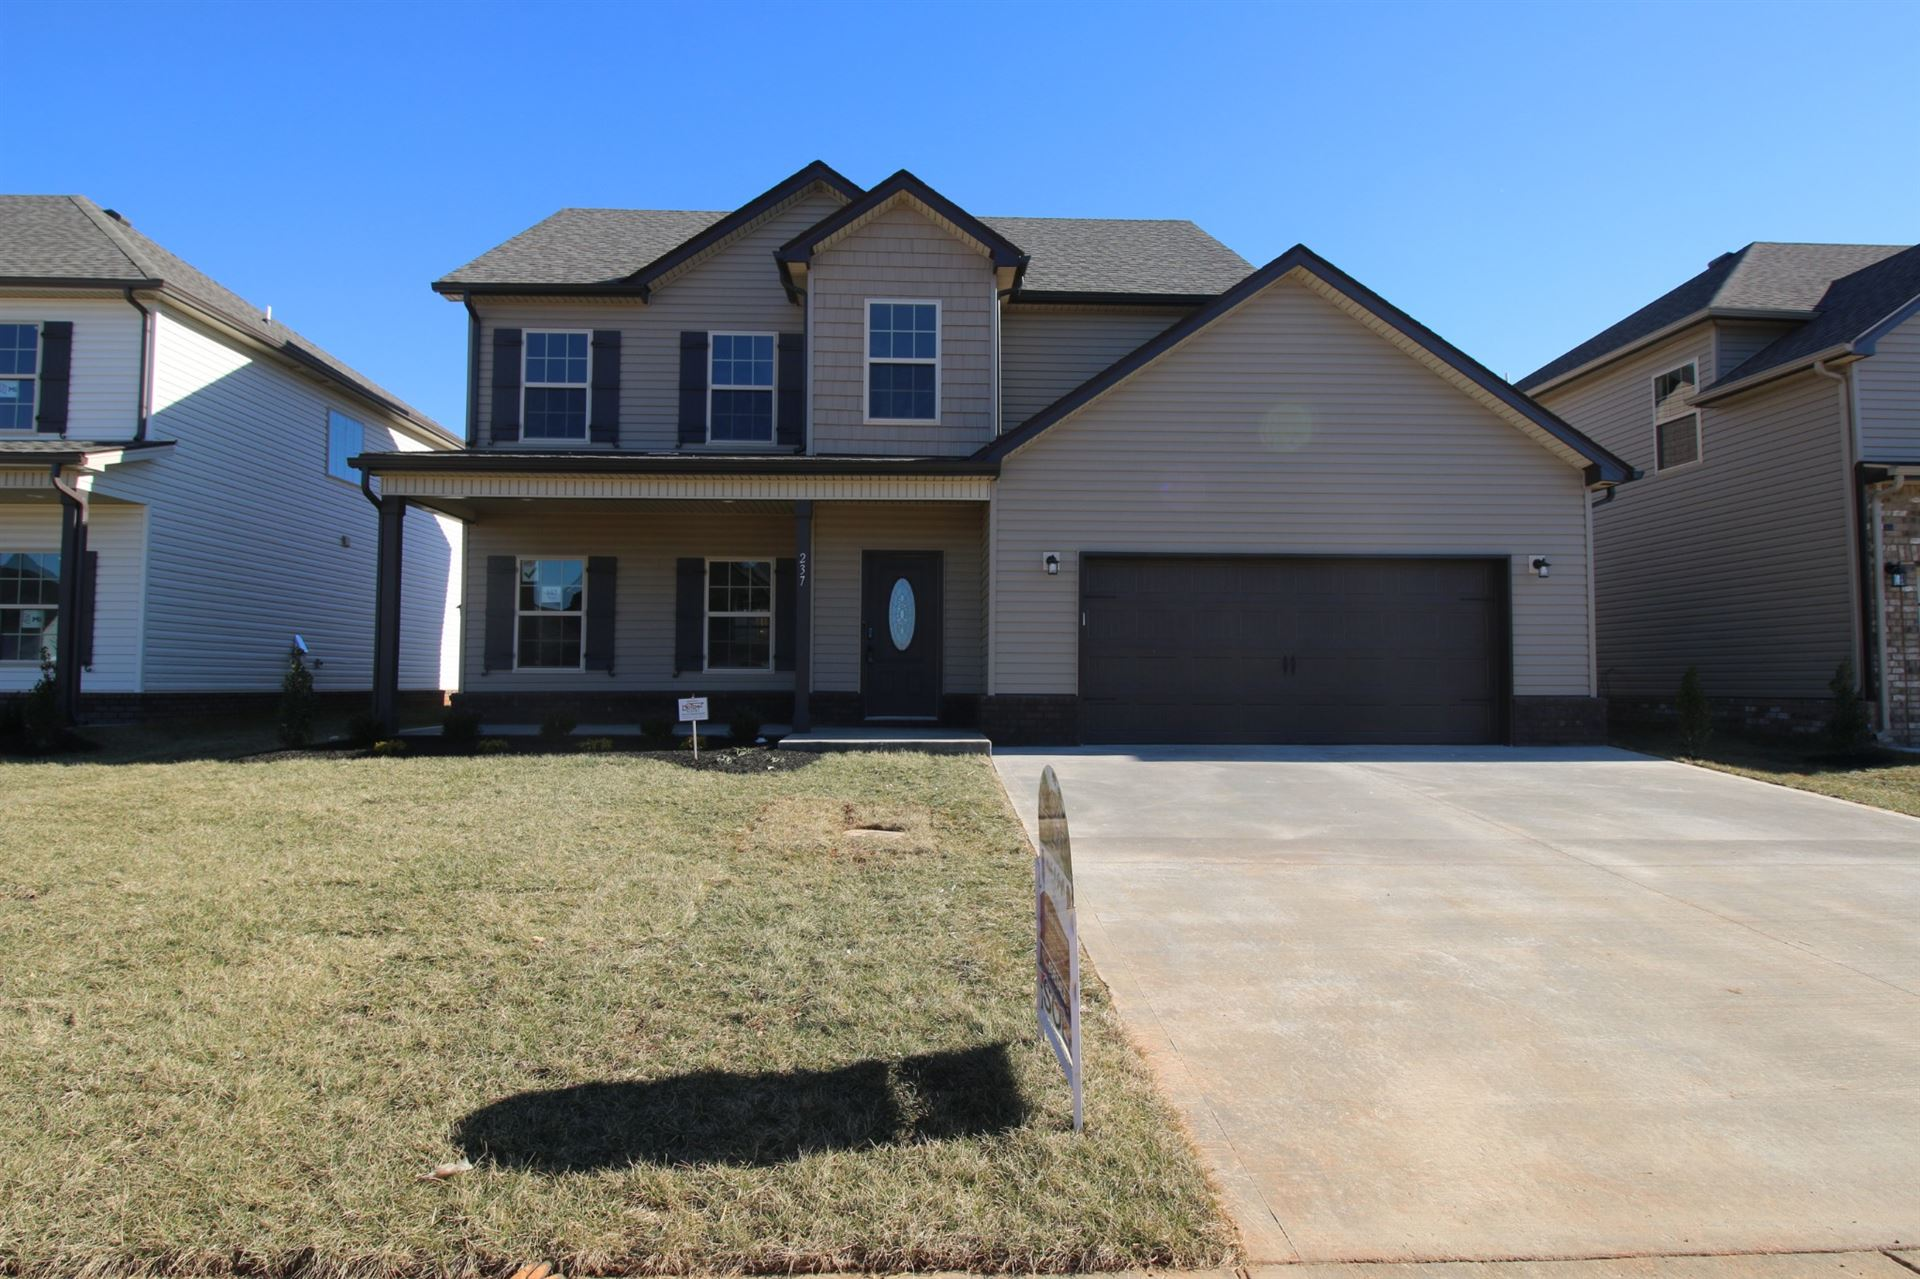 163 Mills Creek, Clarksville, TN 37042 - MLS#: 2294024